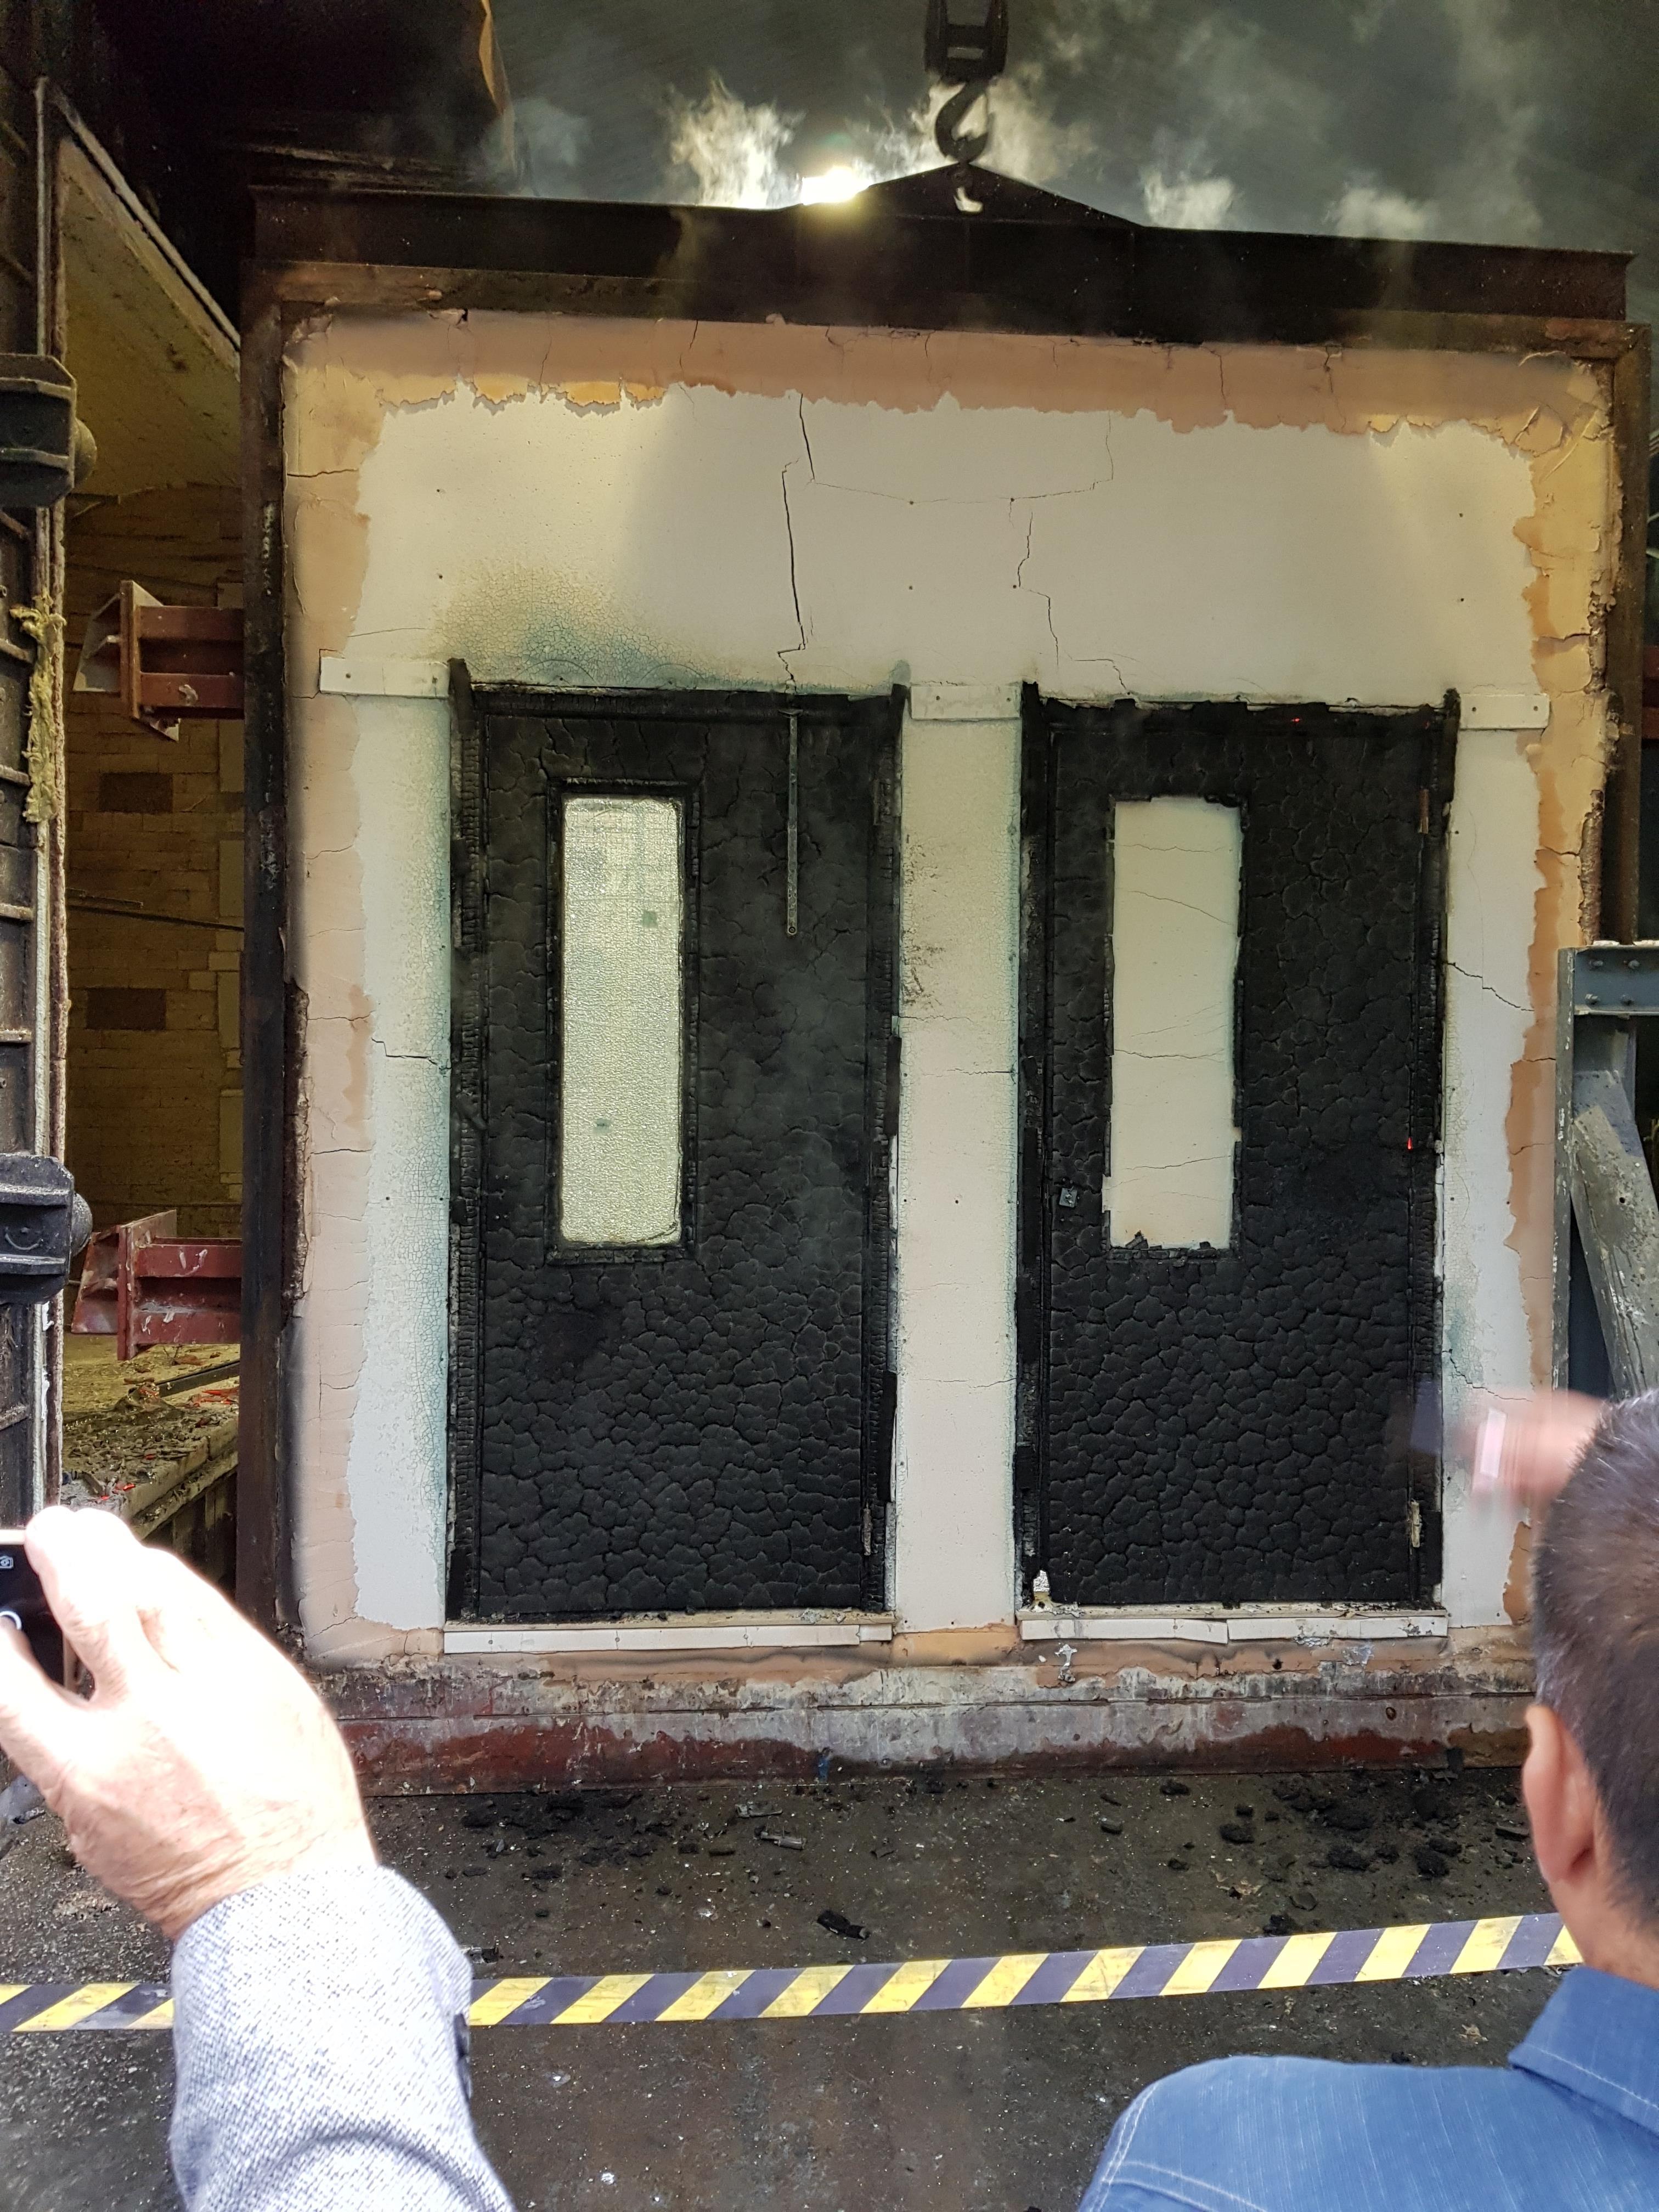 test image fire damage copy